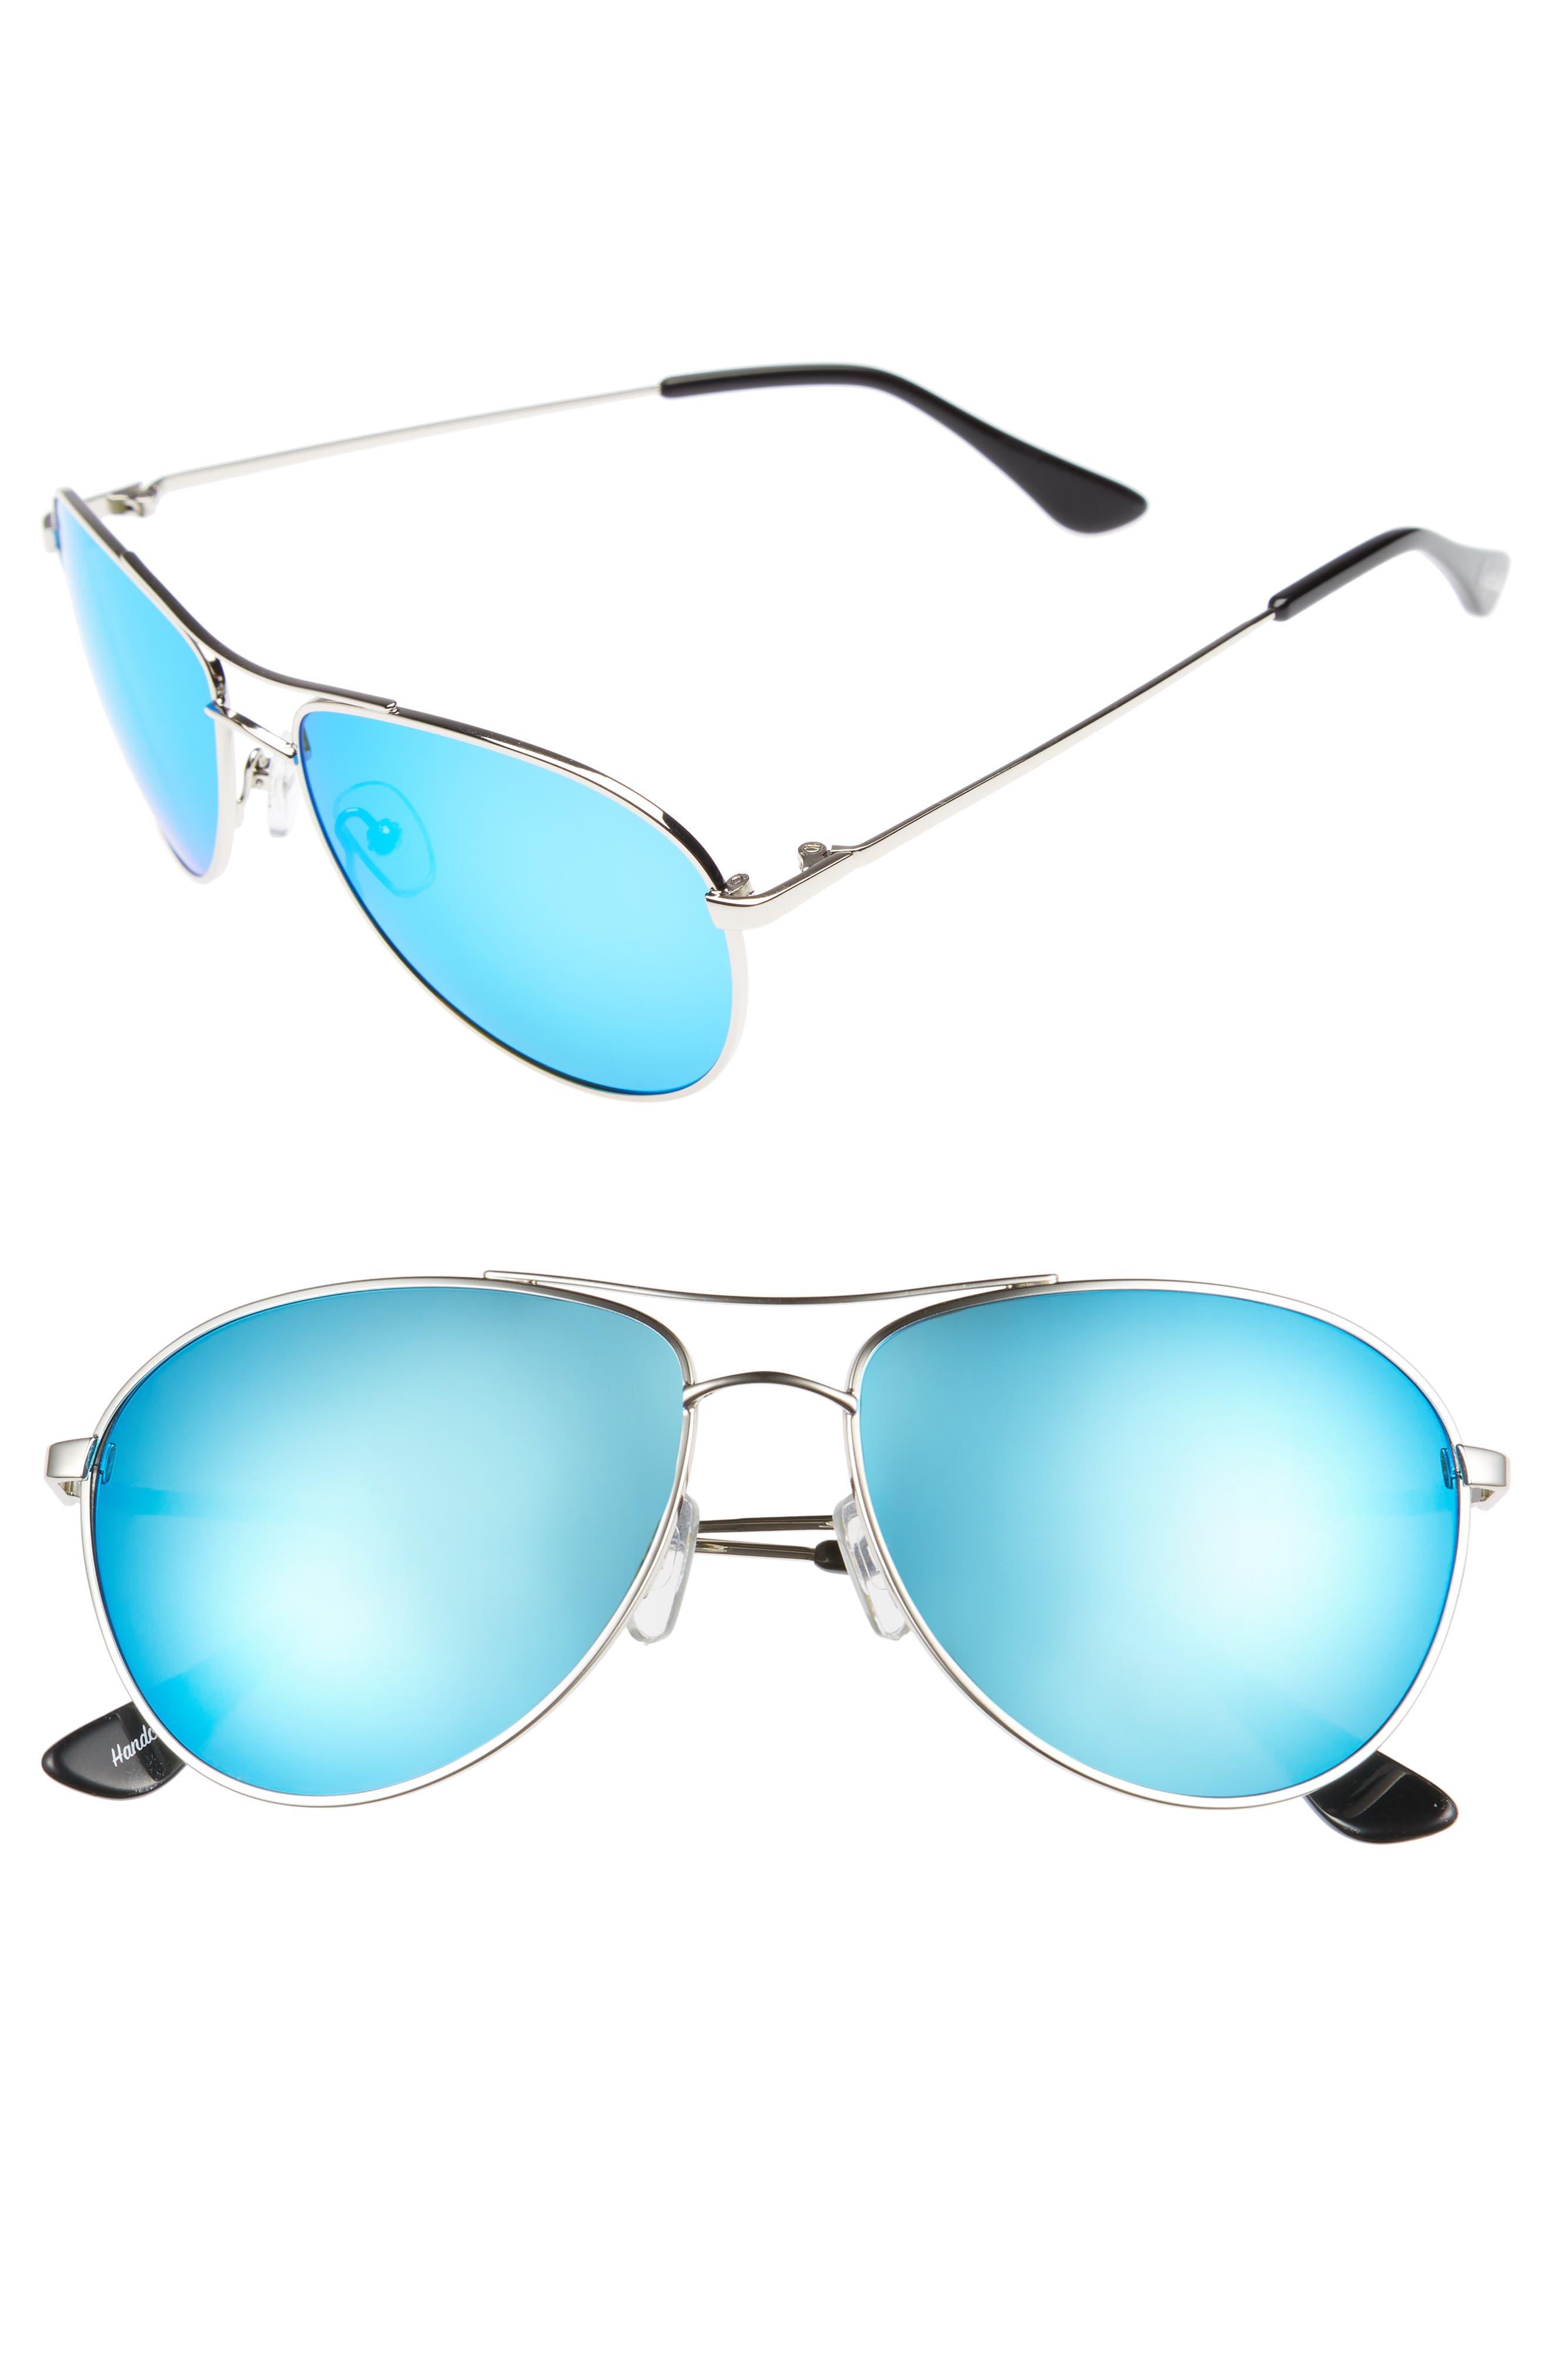 Orville 58mm Mirrored Aviator Sunglasses,                         Main,                         color, Silver/ Blue Mirror